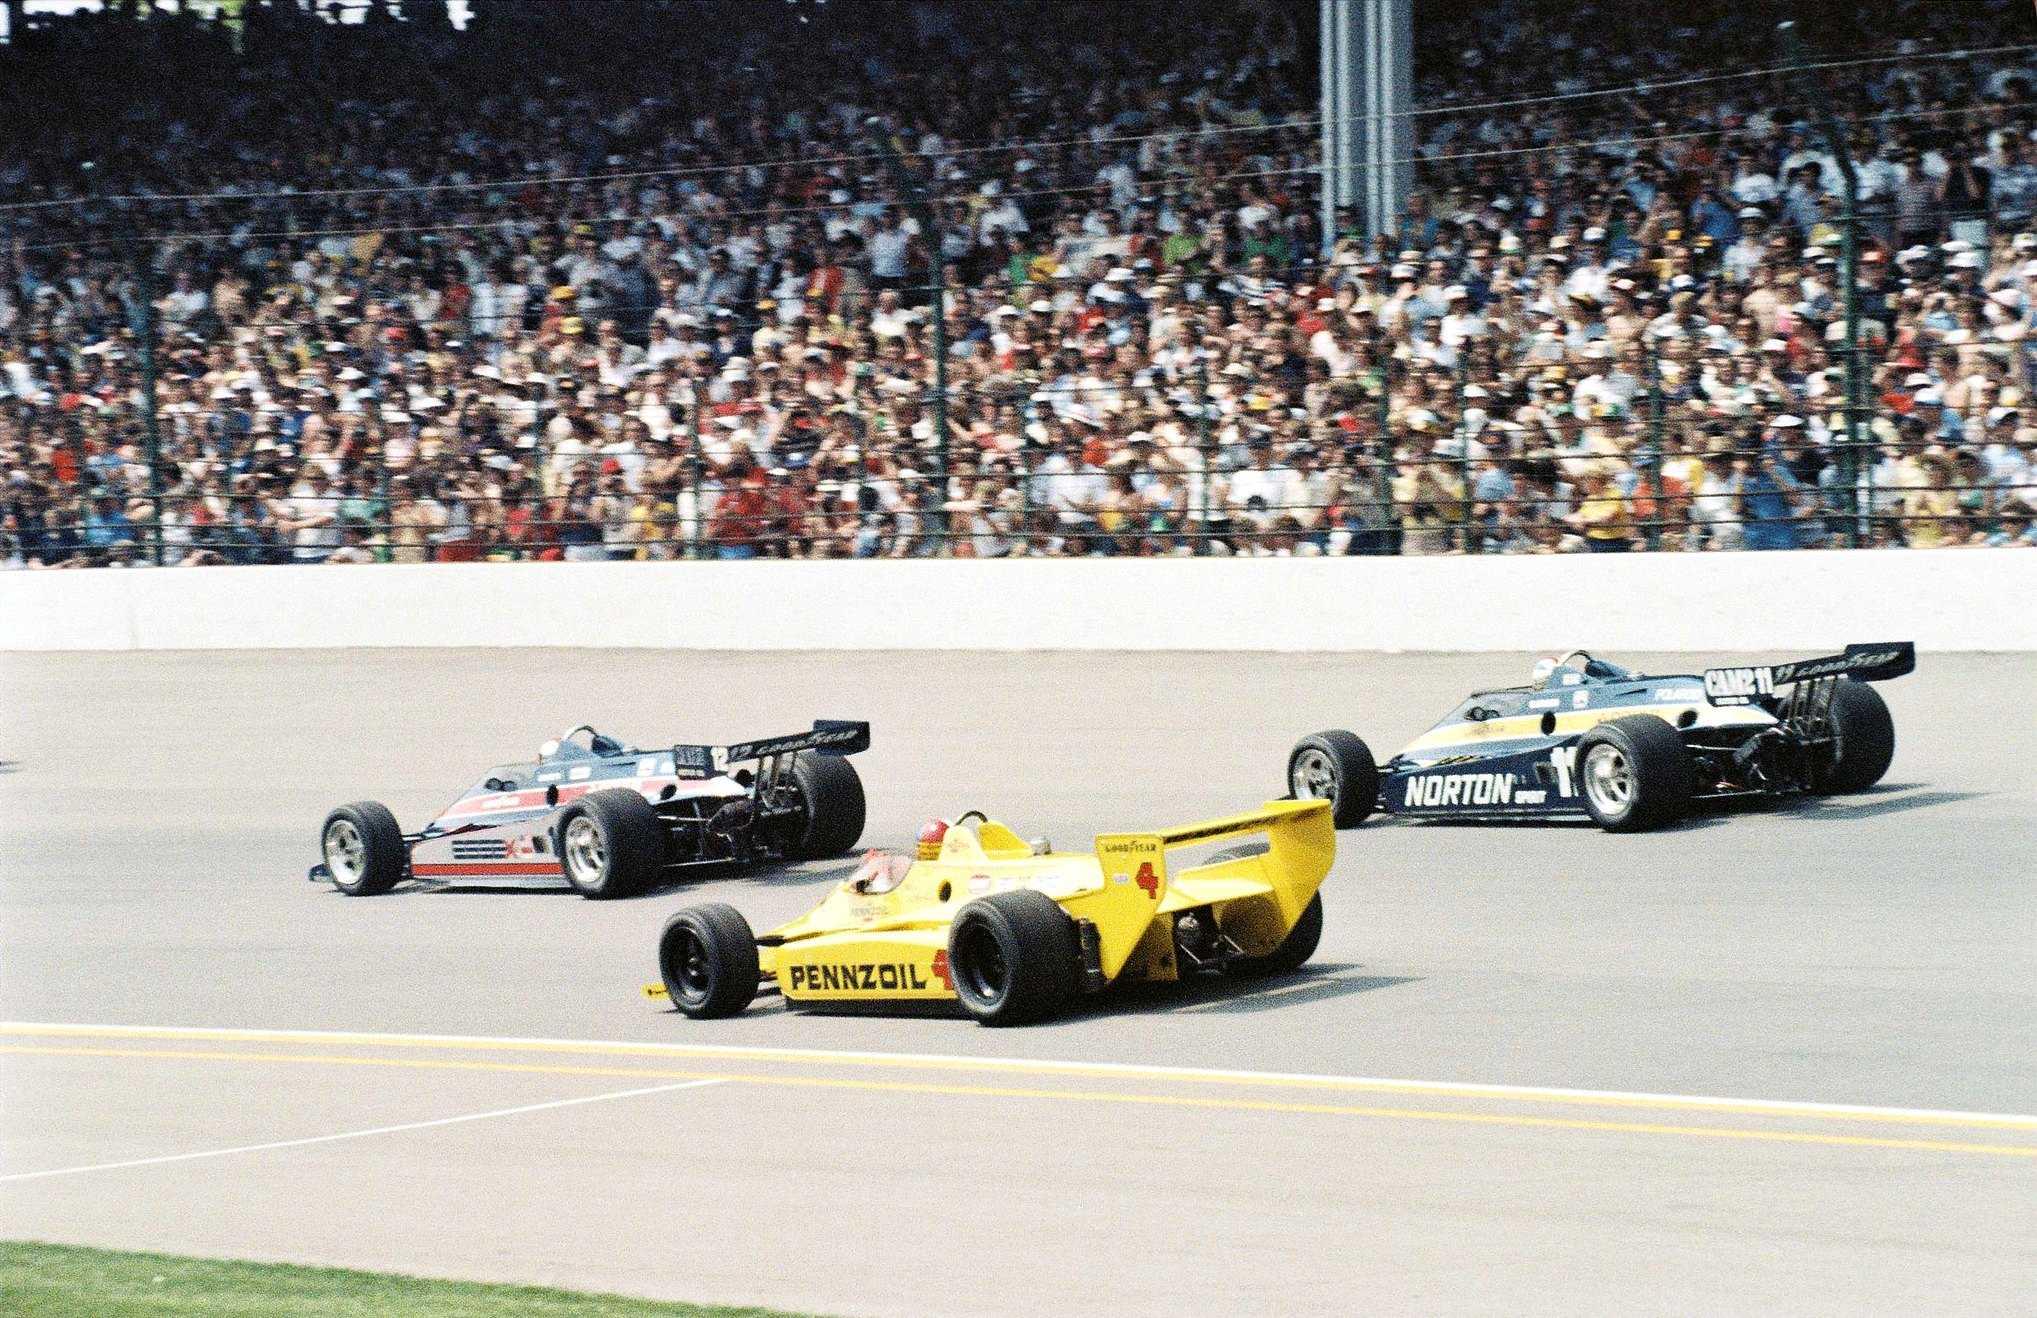 Старт «Инди-500»'80. Джонни Разерфорд (№4, «Чапаррал 2K Косуорт») против пары гонщиков «Пенске» – Марио Андретти (№12) и Бобби Анзера (№11, оба на «Пенске PC9 Косуорт»)